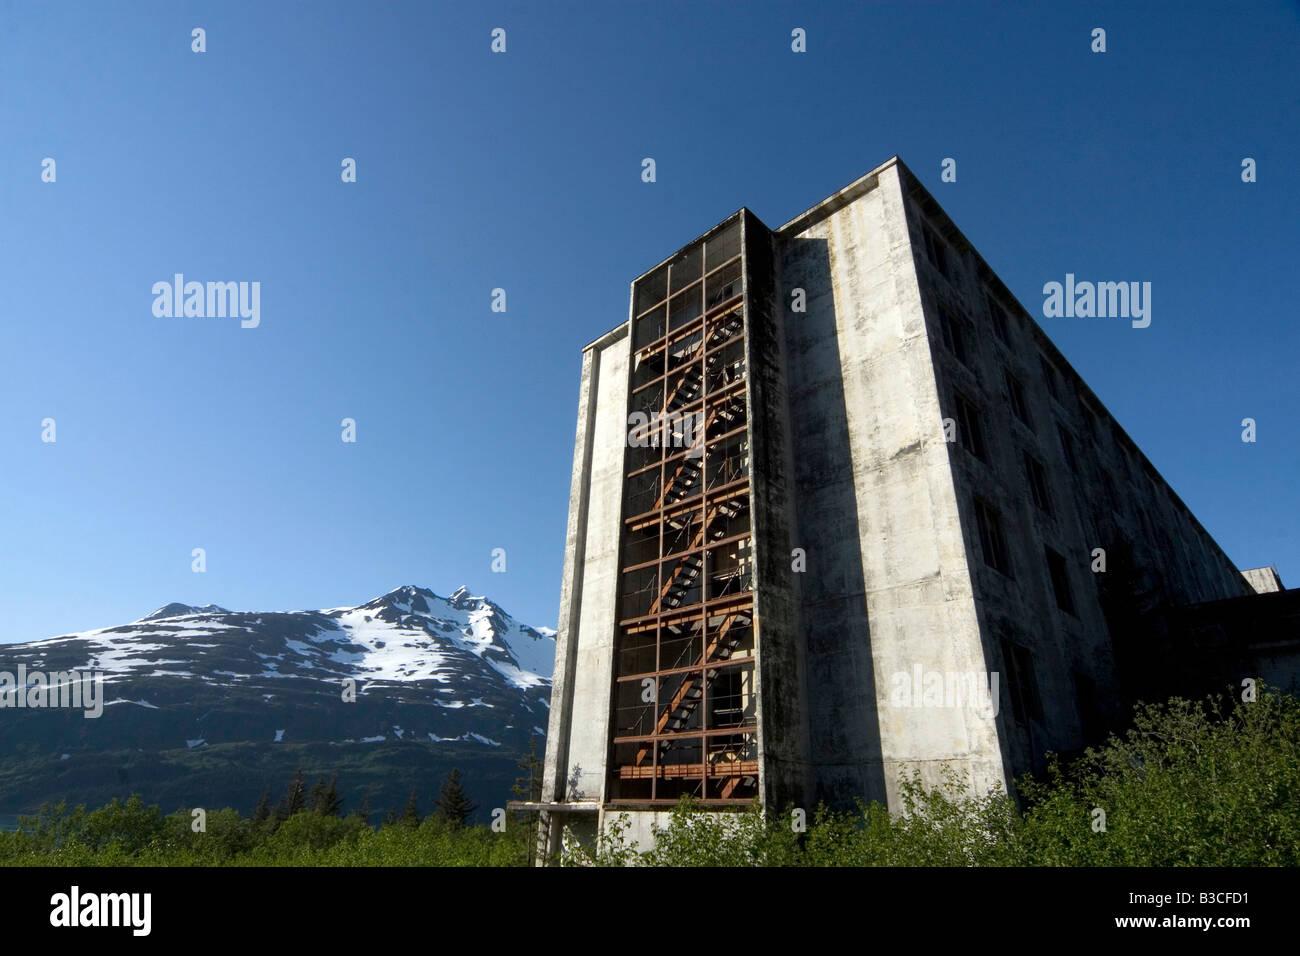 The Buckner Building Whittier Alaska - Stock Image